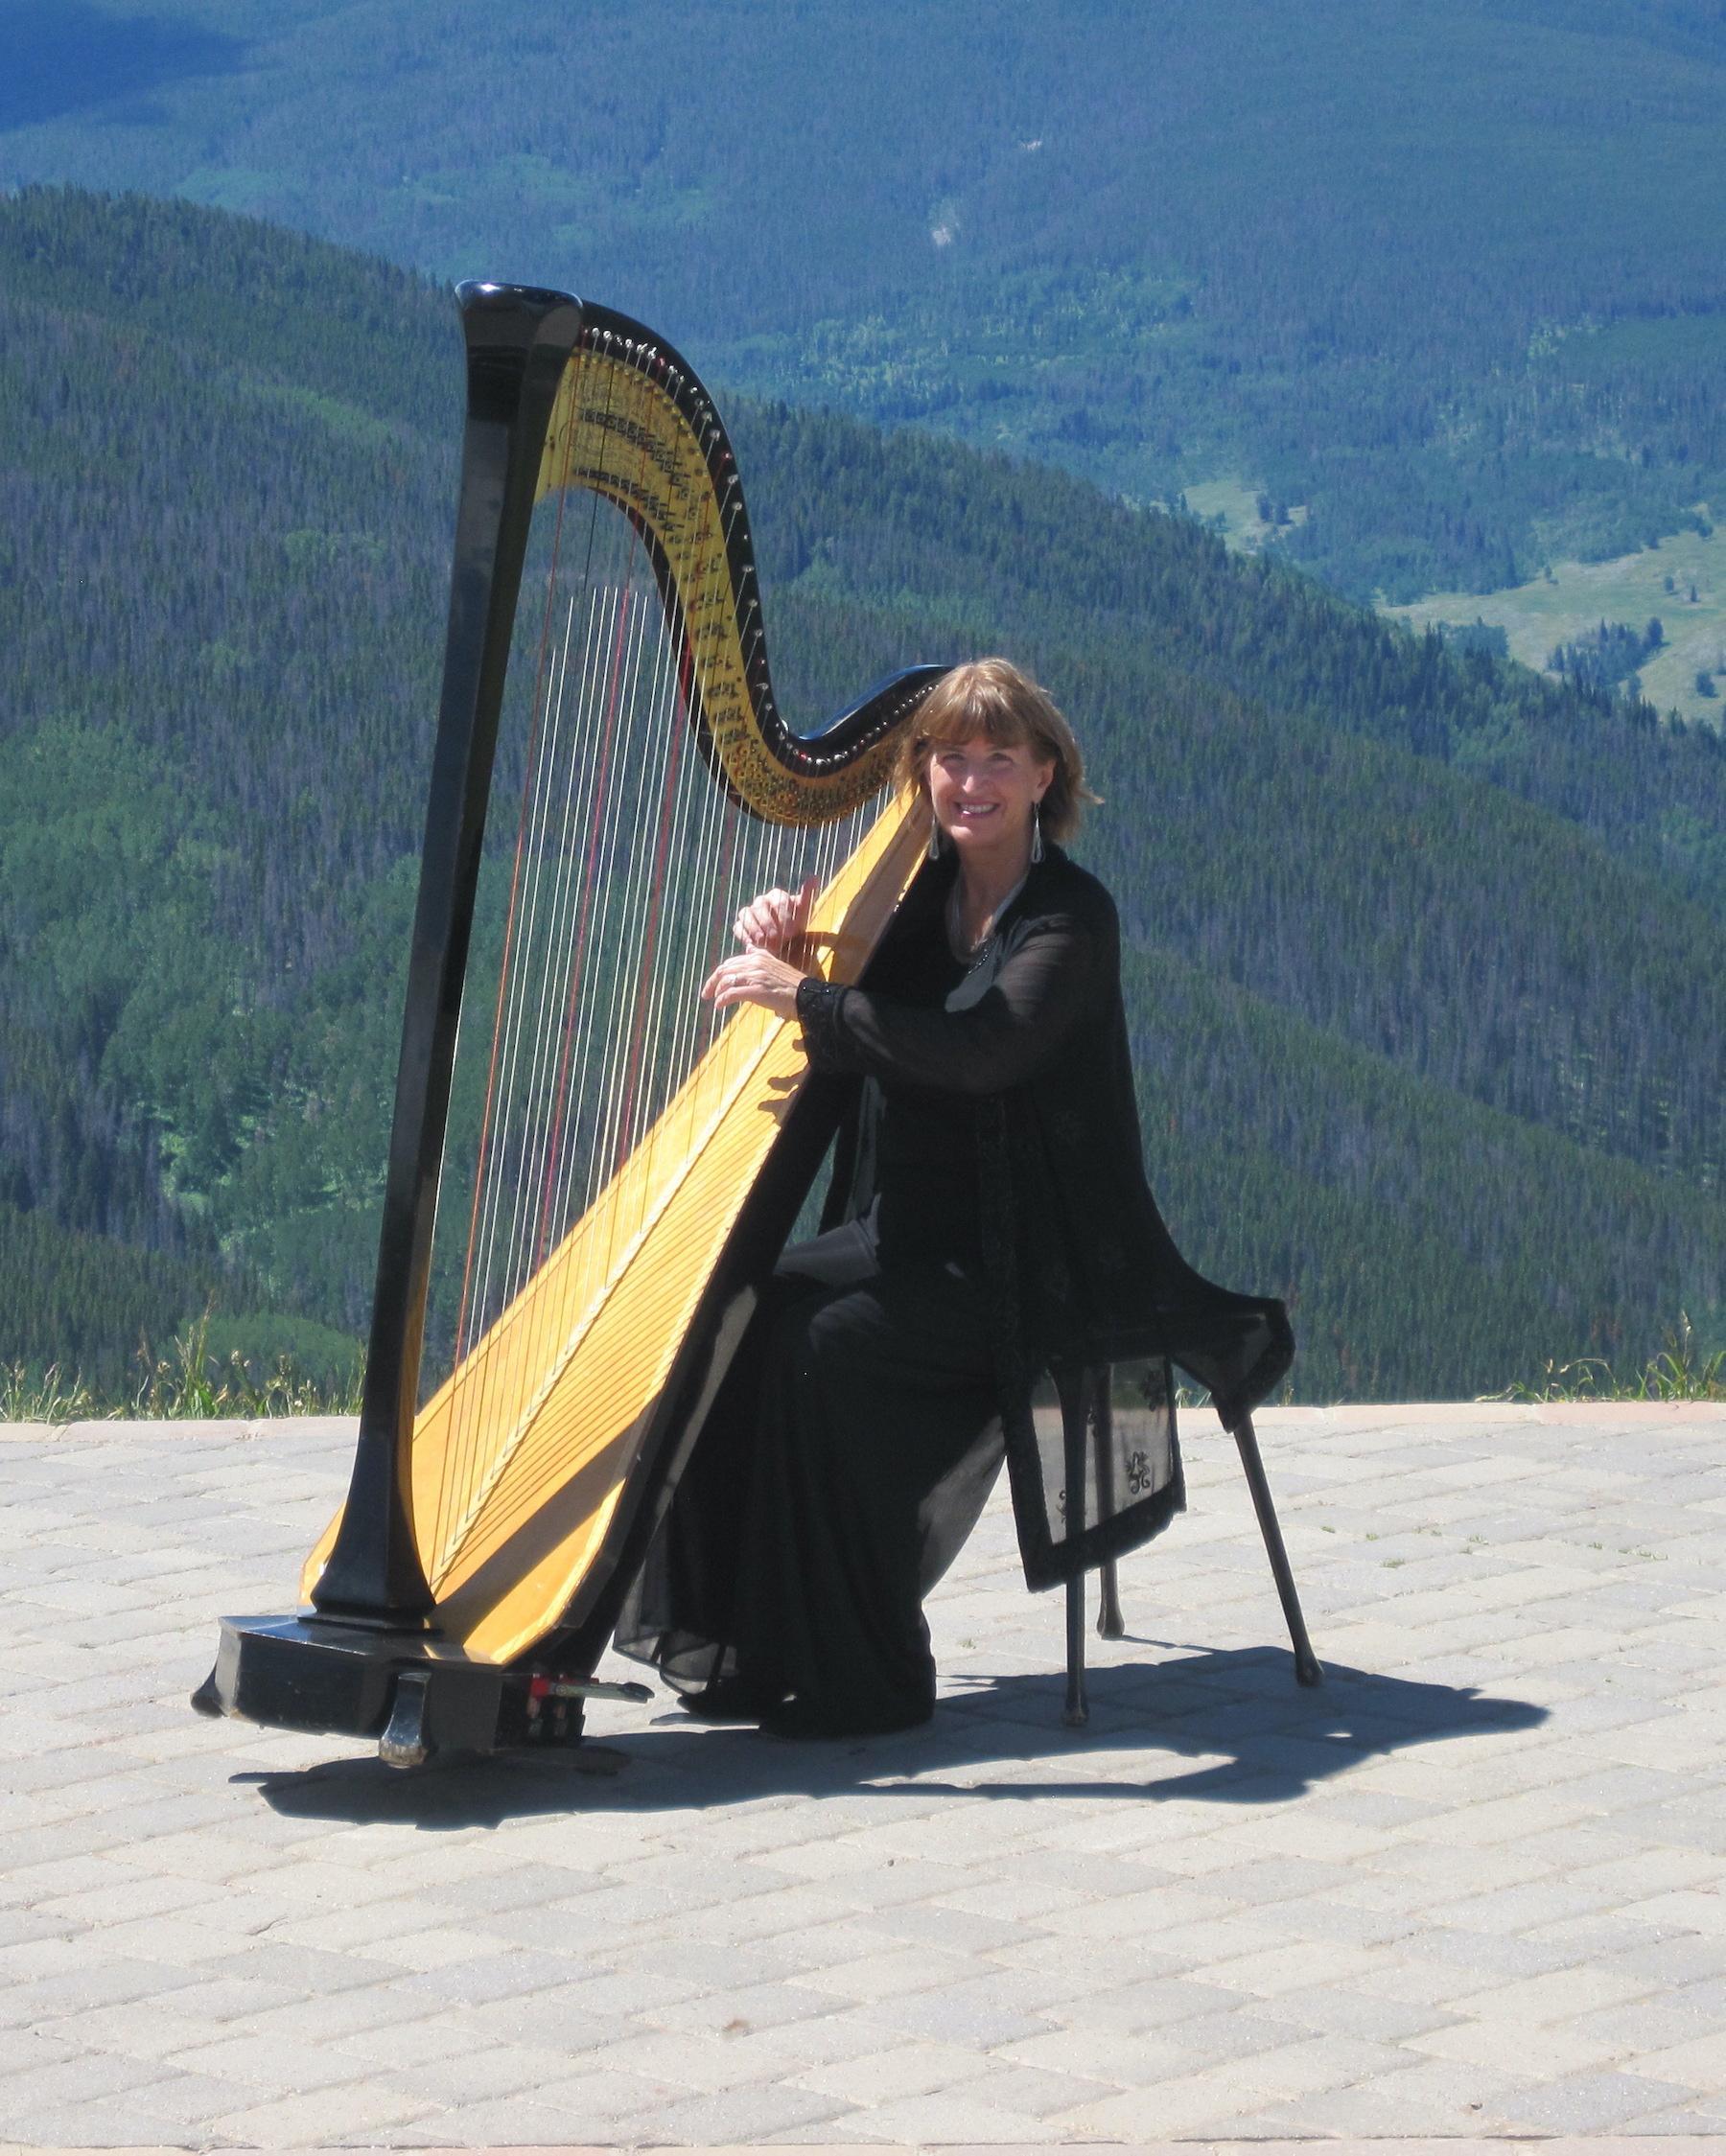 Barbara playing harp wedding music in Vail, Colorado.